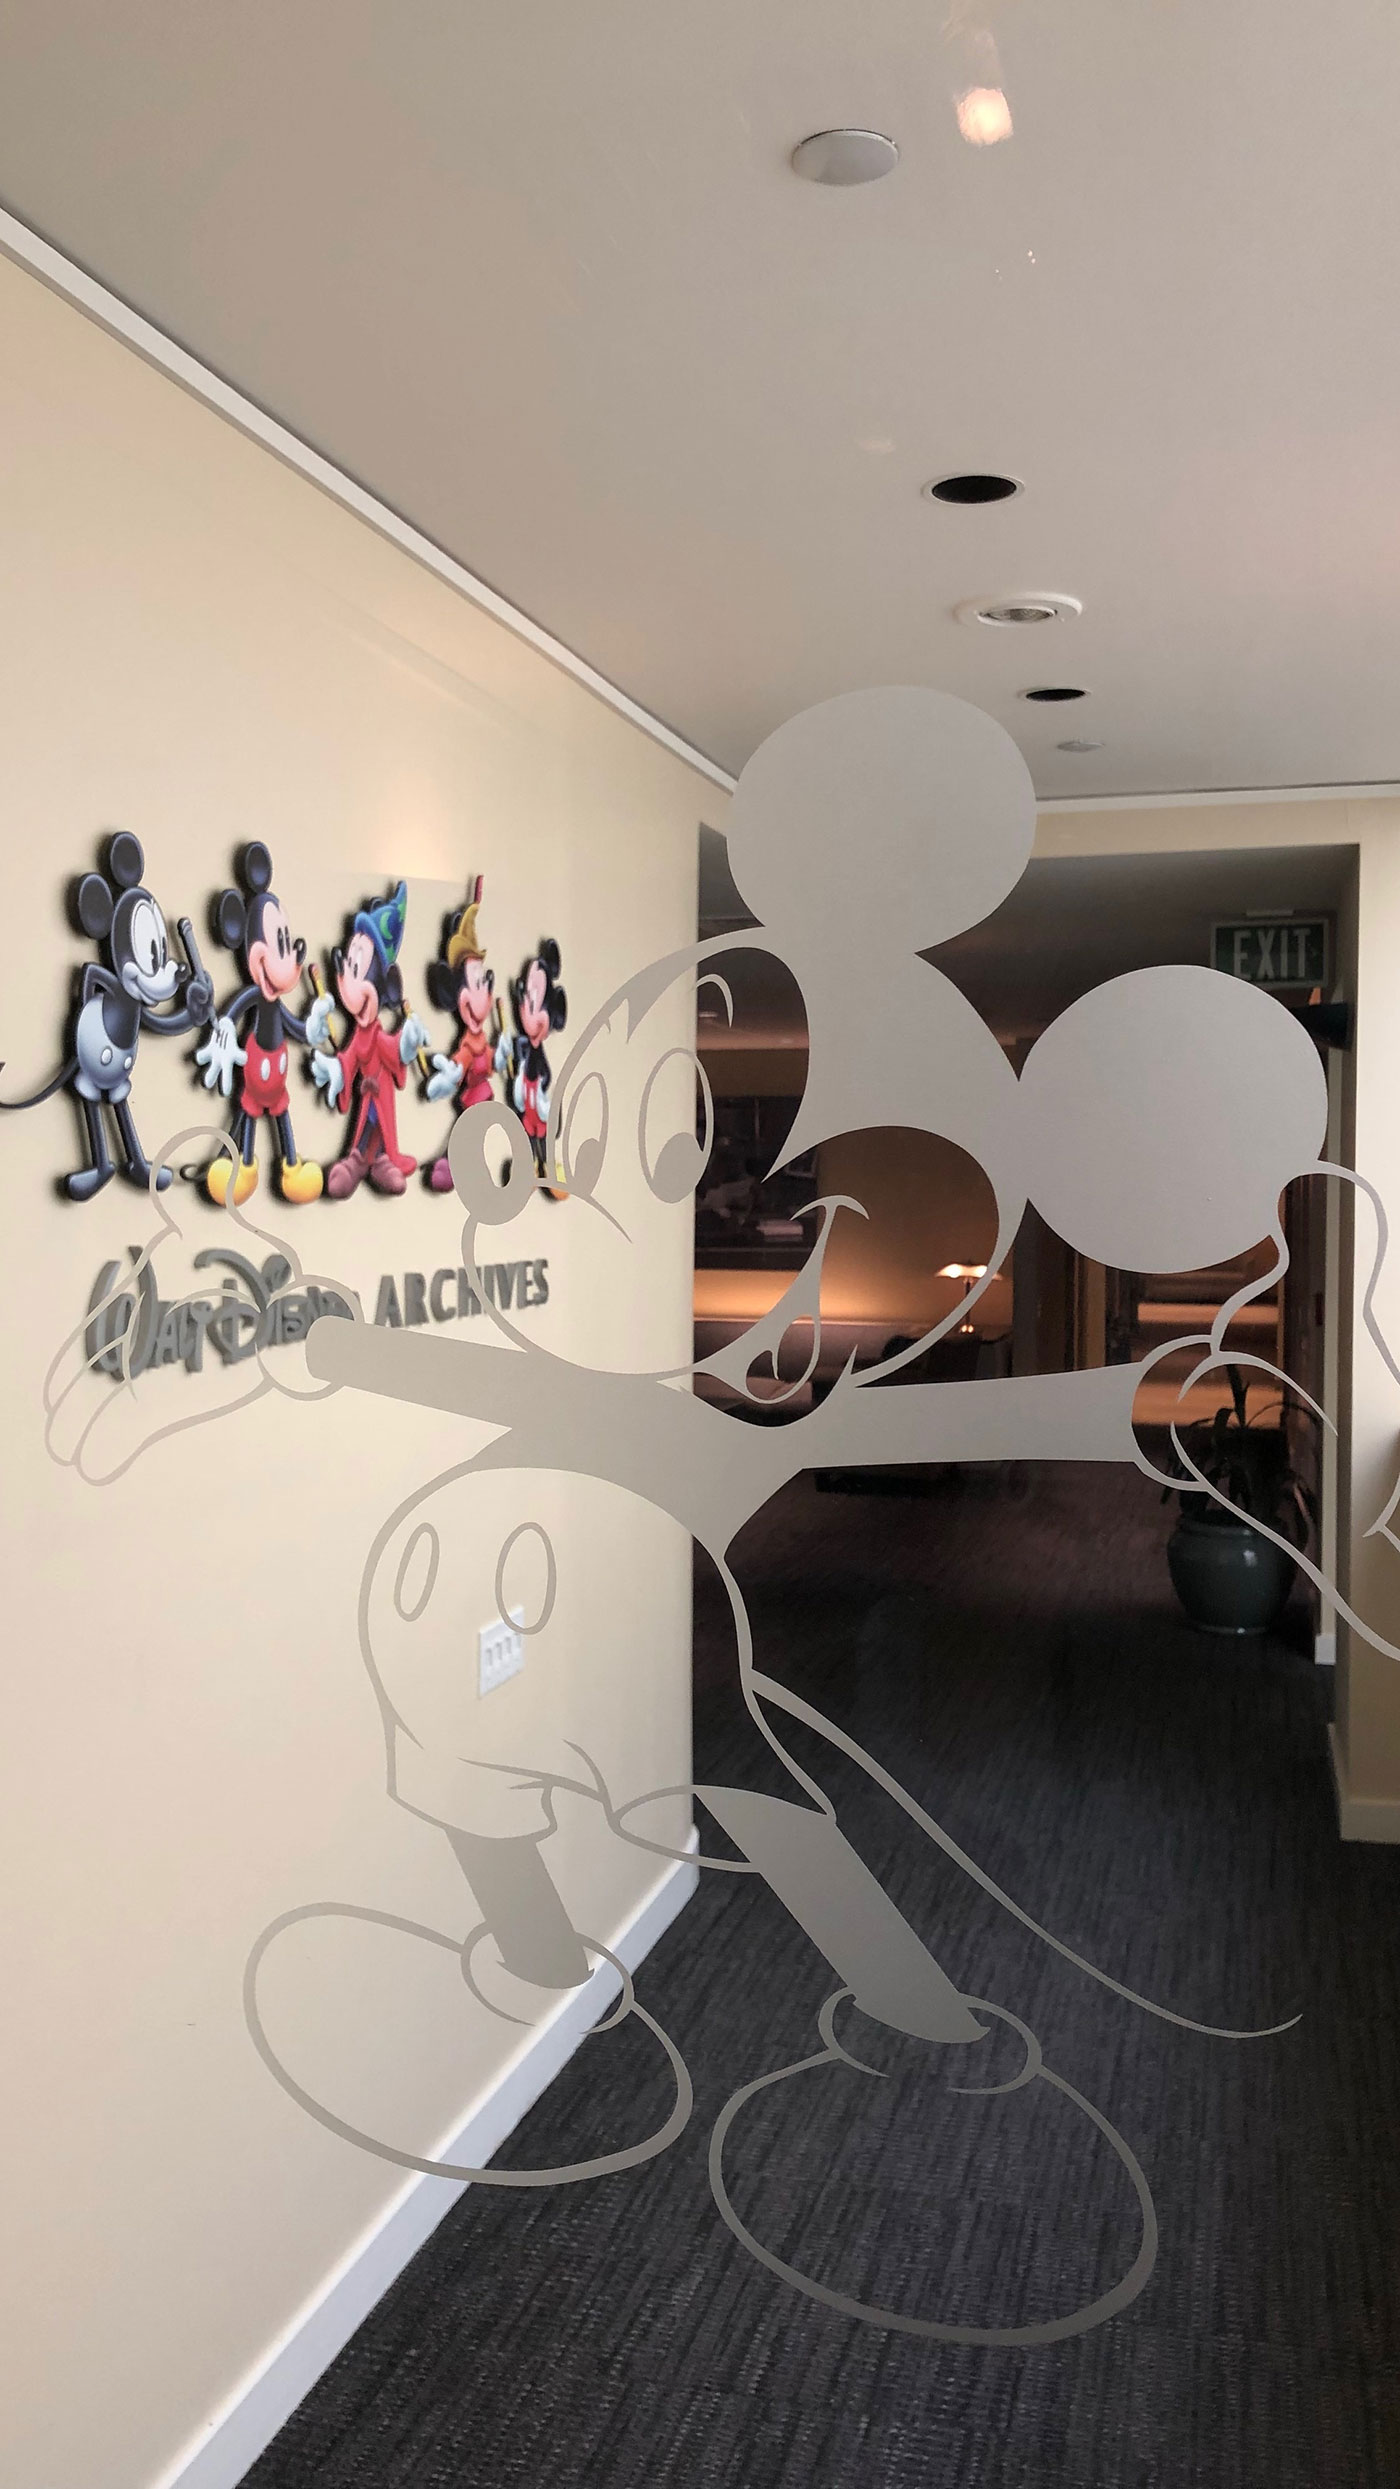 Disney interior design internship - How to get a job as an interior decorator ...